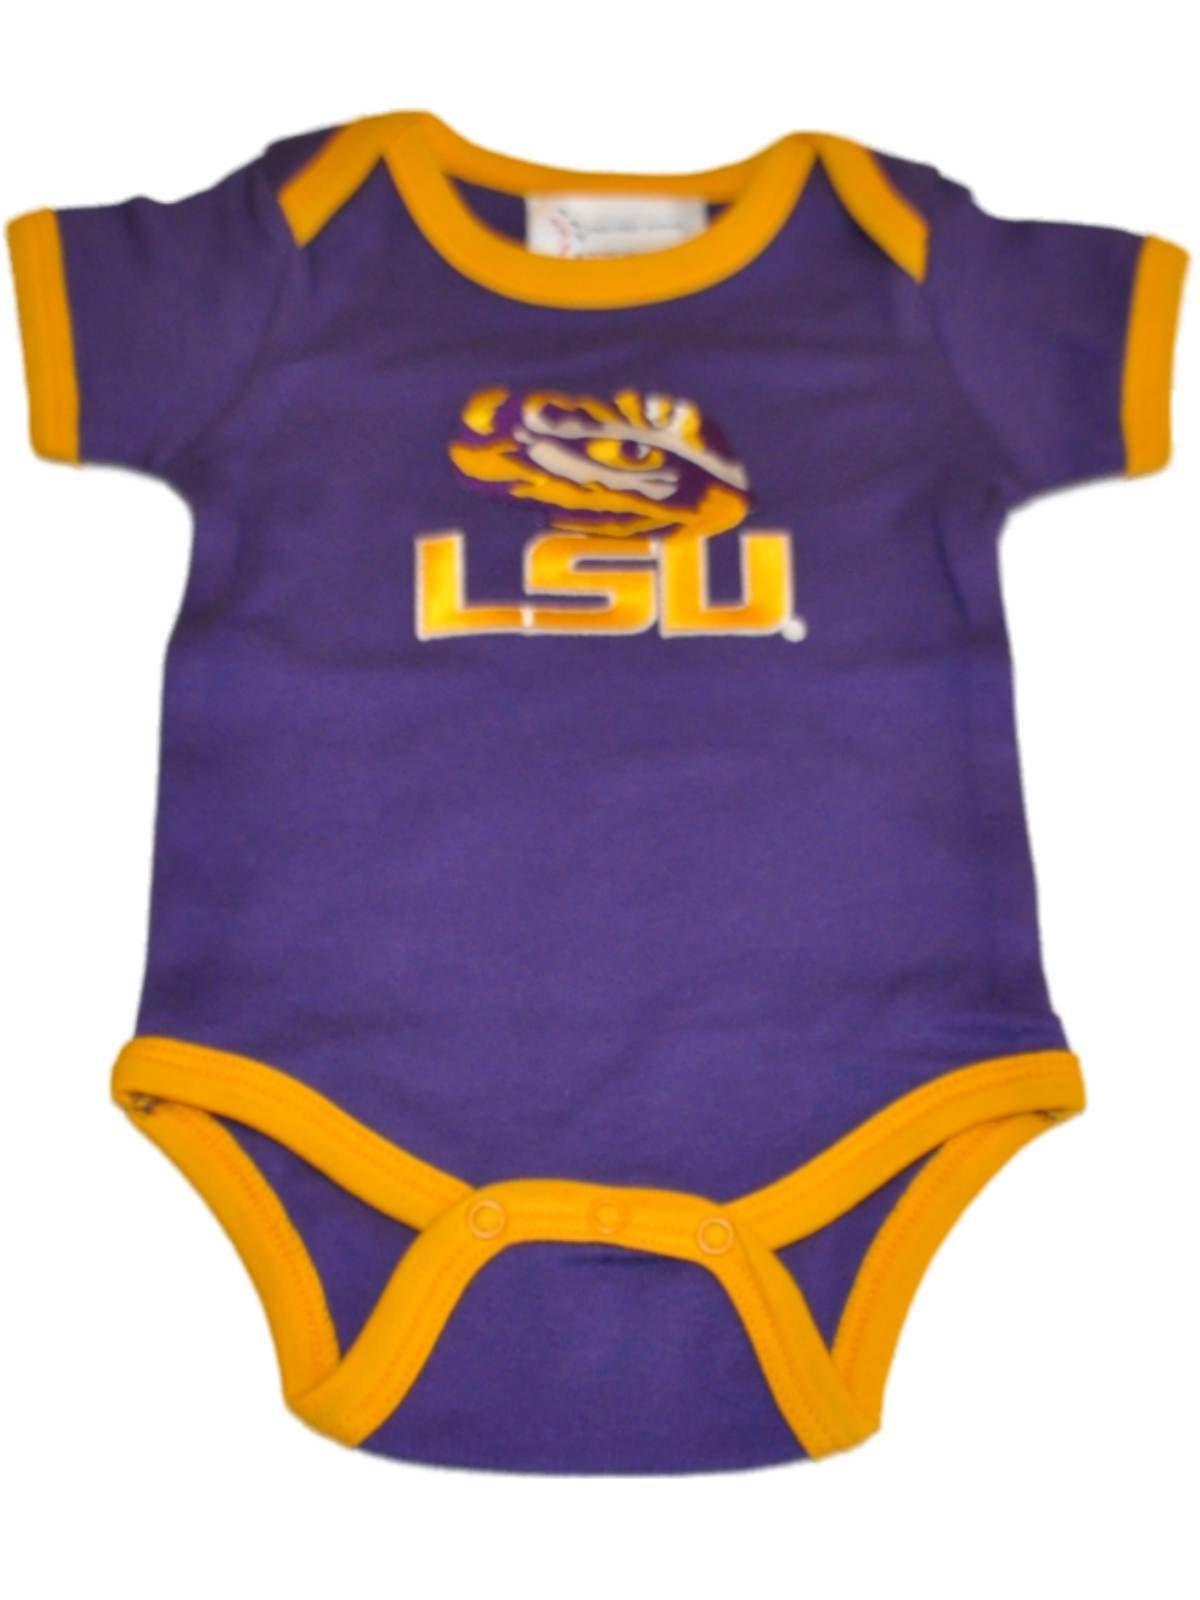 ff61eef9a LSU Tigers TFA Infant Baby Lap Shoulder Ringer Romper One Piece ...